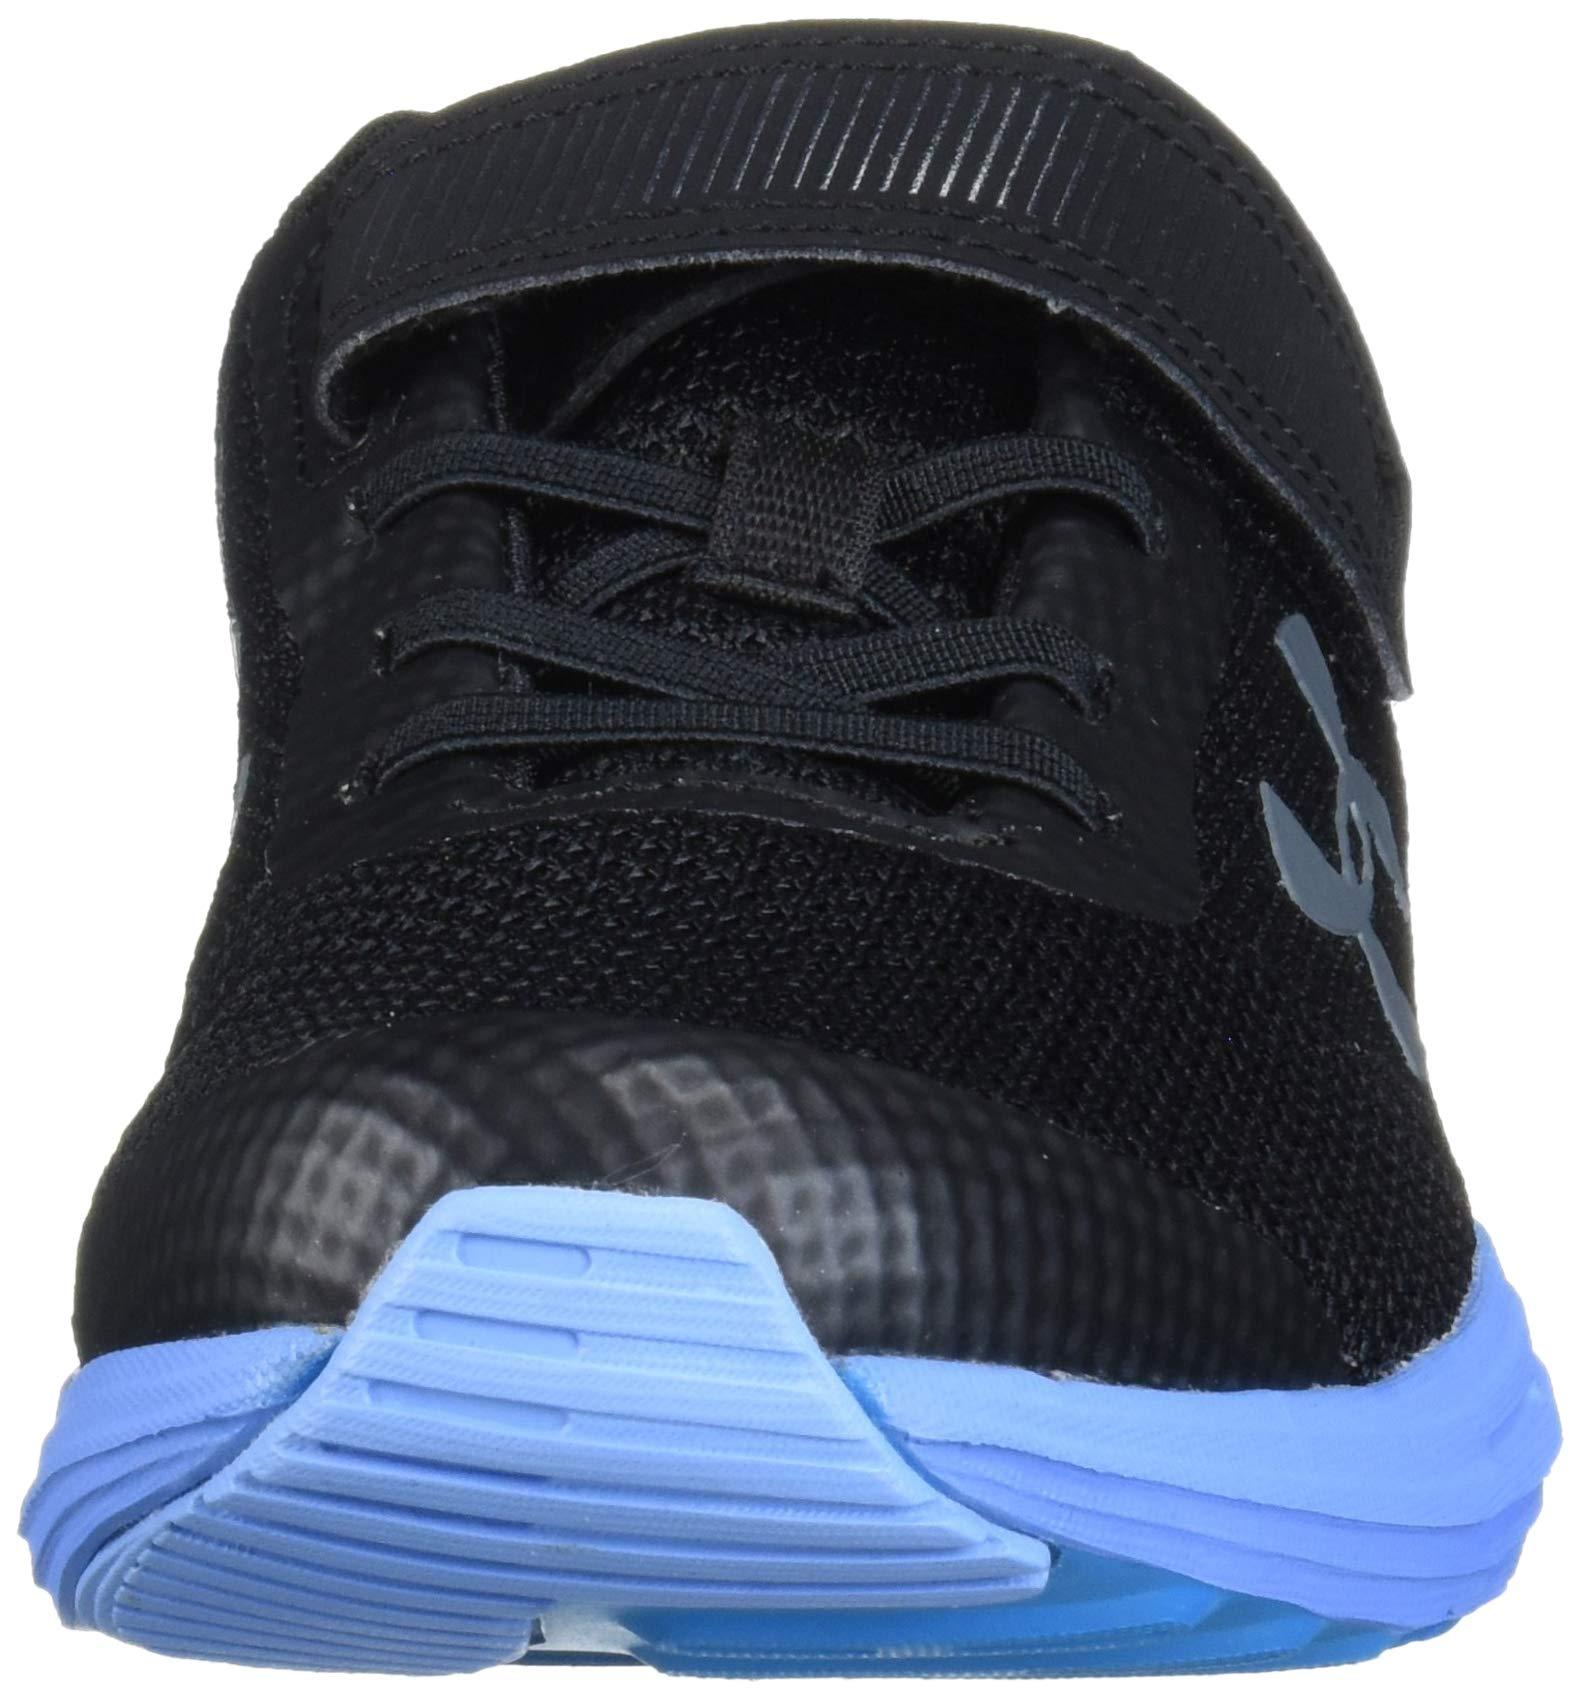 Under Armour Boys Pre School Surge Rn Alternate Closure Sneaker 3020485